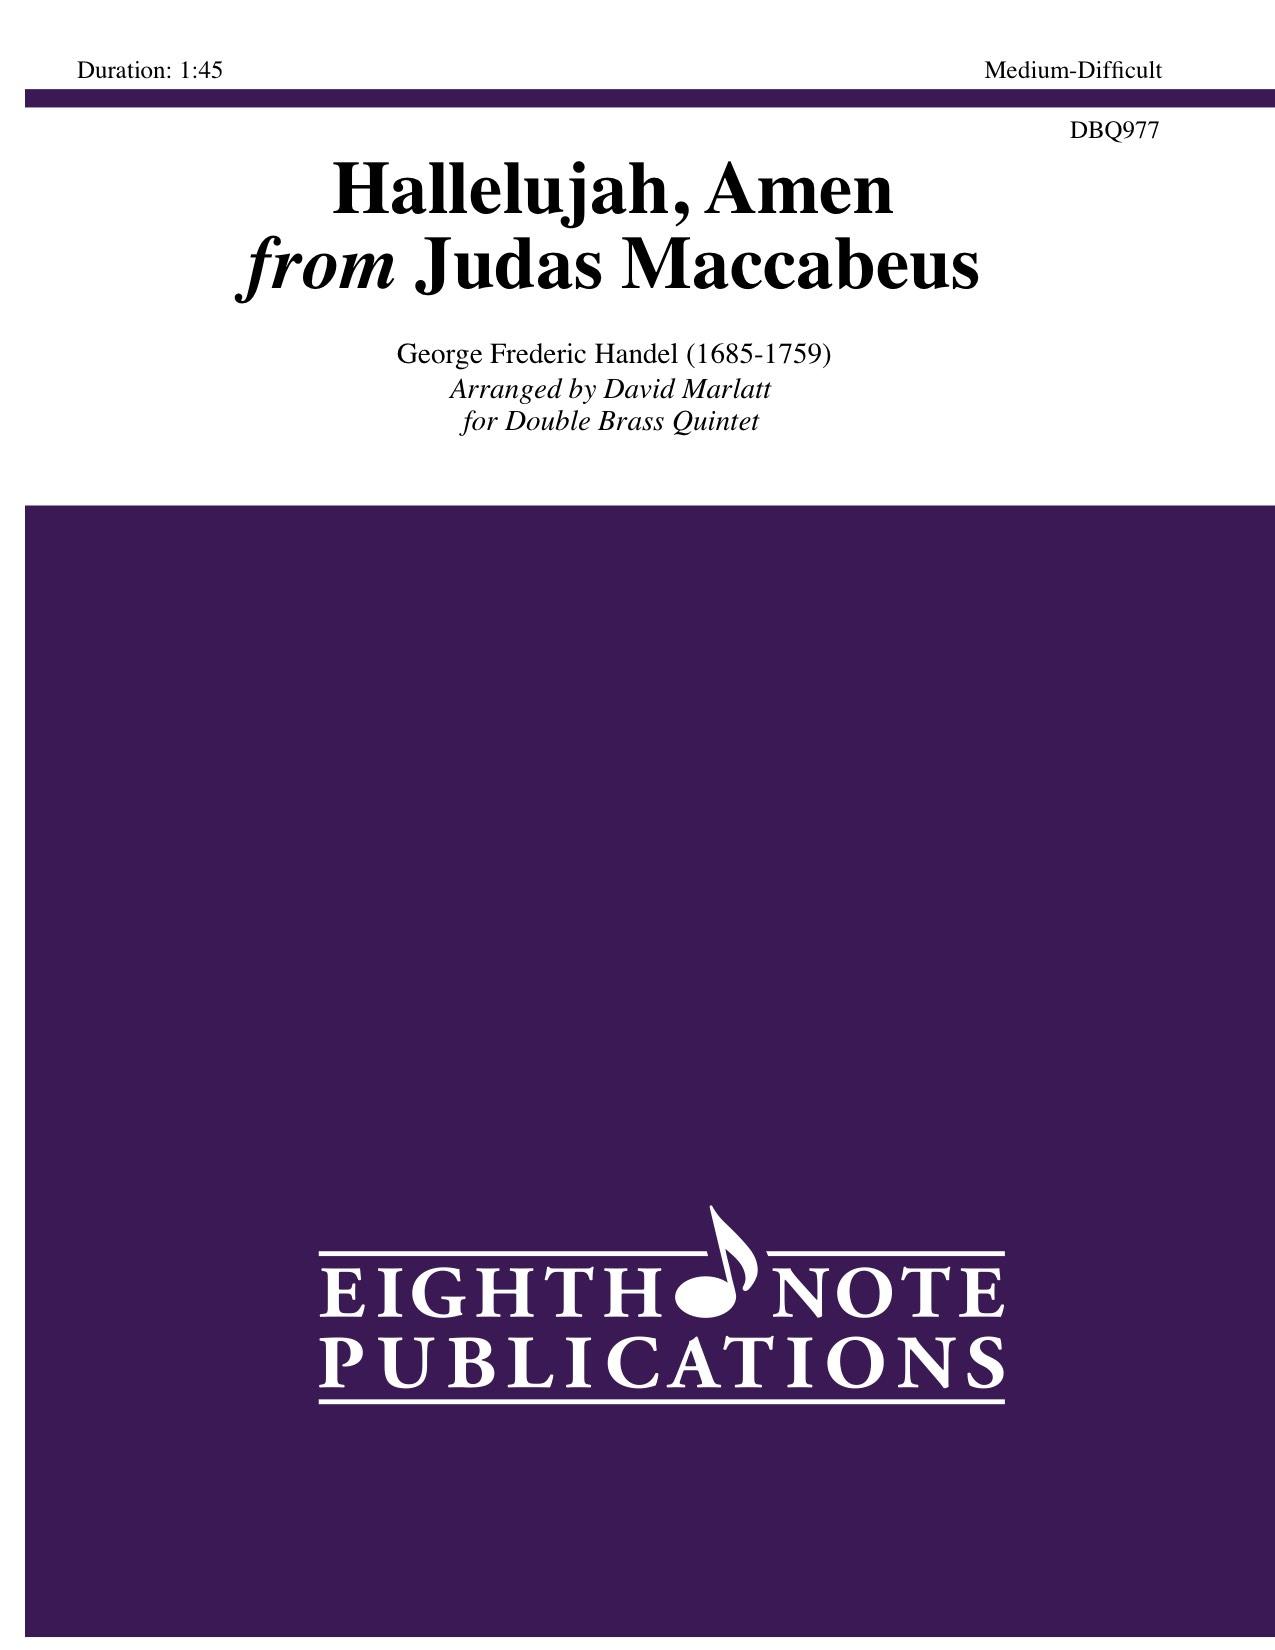 Hallelujah, Amen from Judas Maccabeus - George Frederic Handel